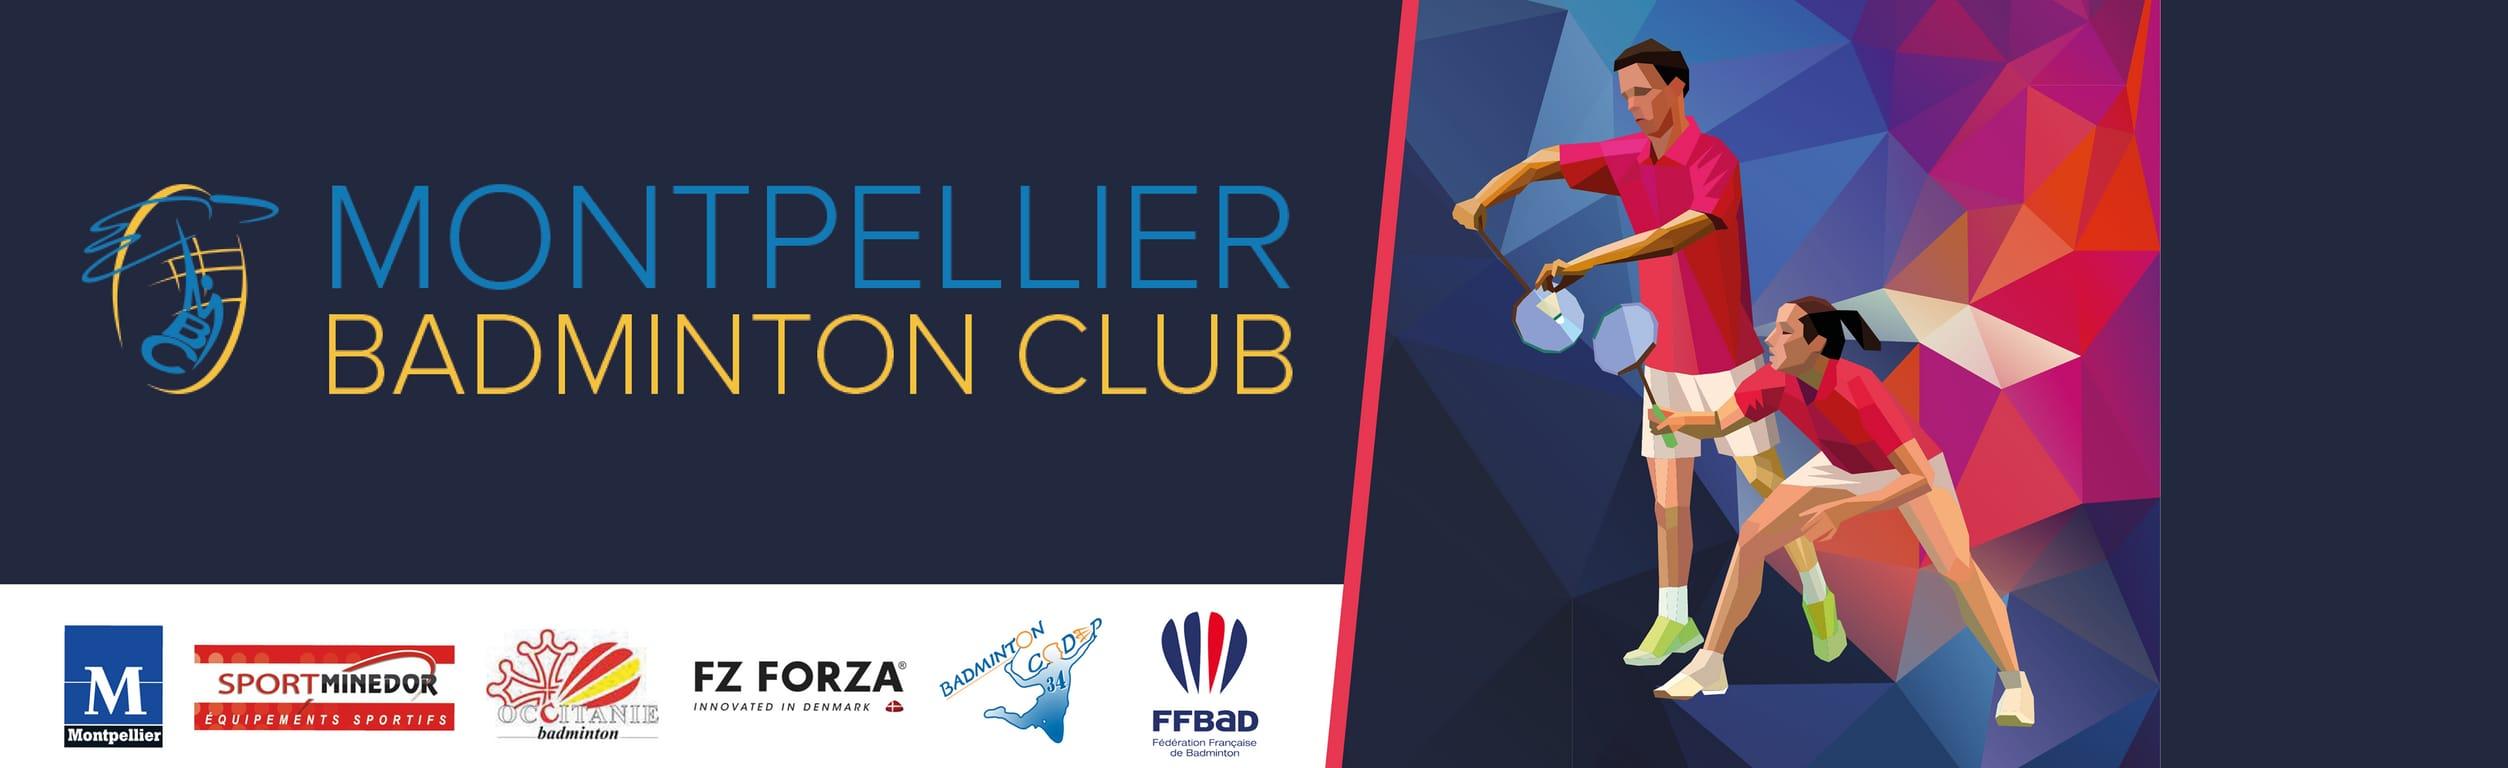 Montpellier Badminton Club